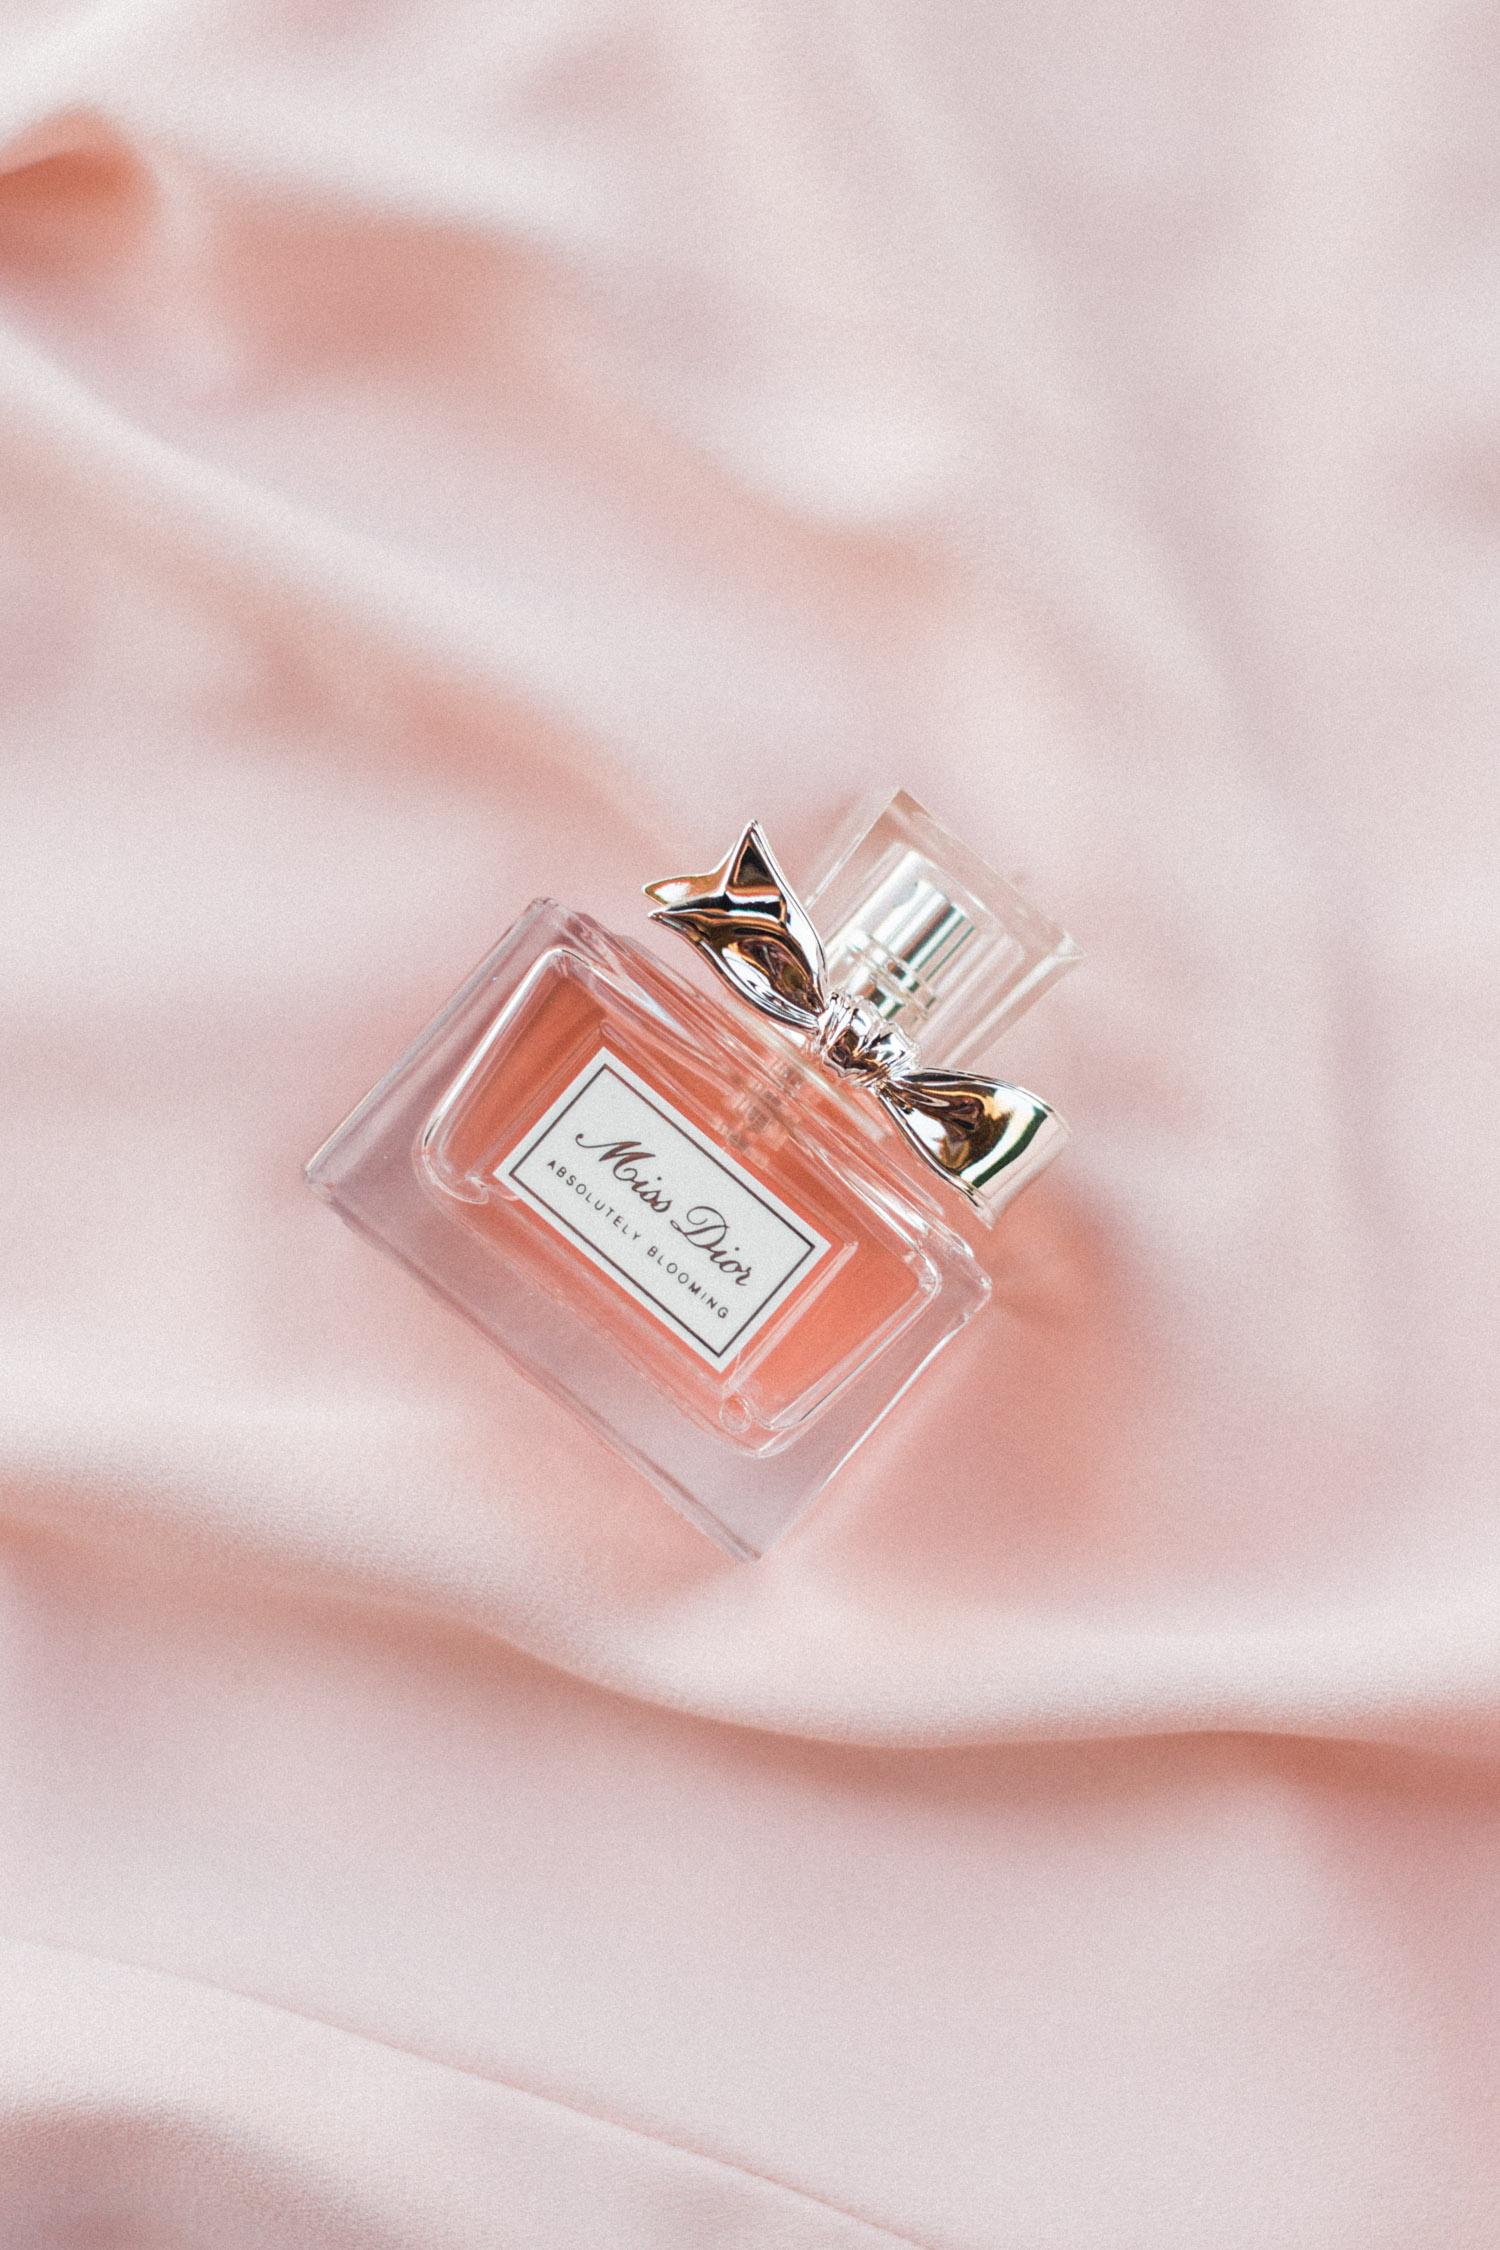 Bride's wedding day perfume